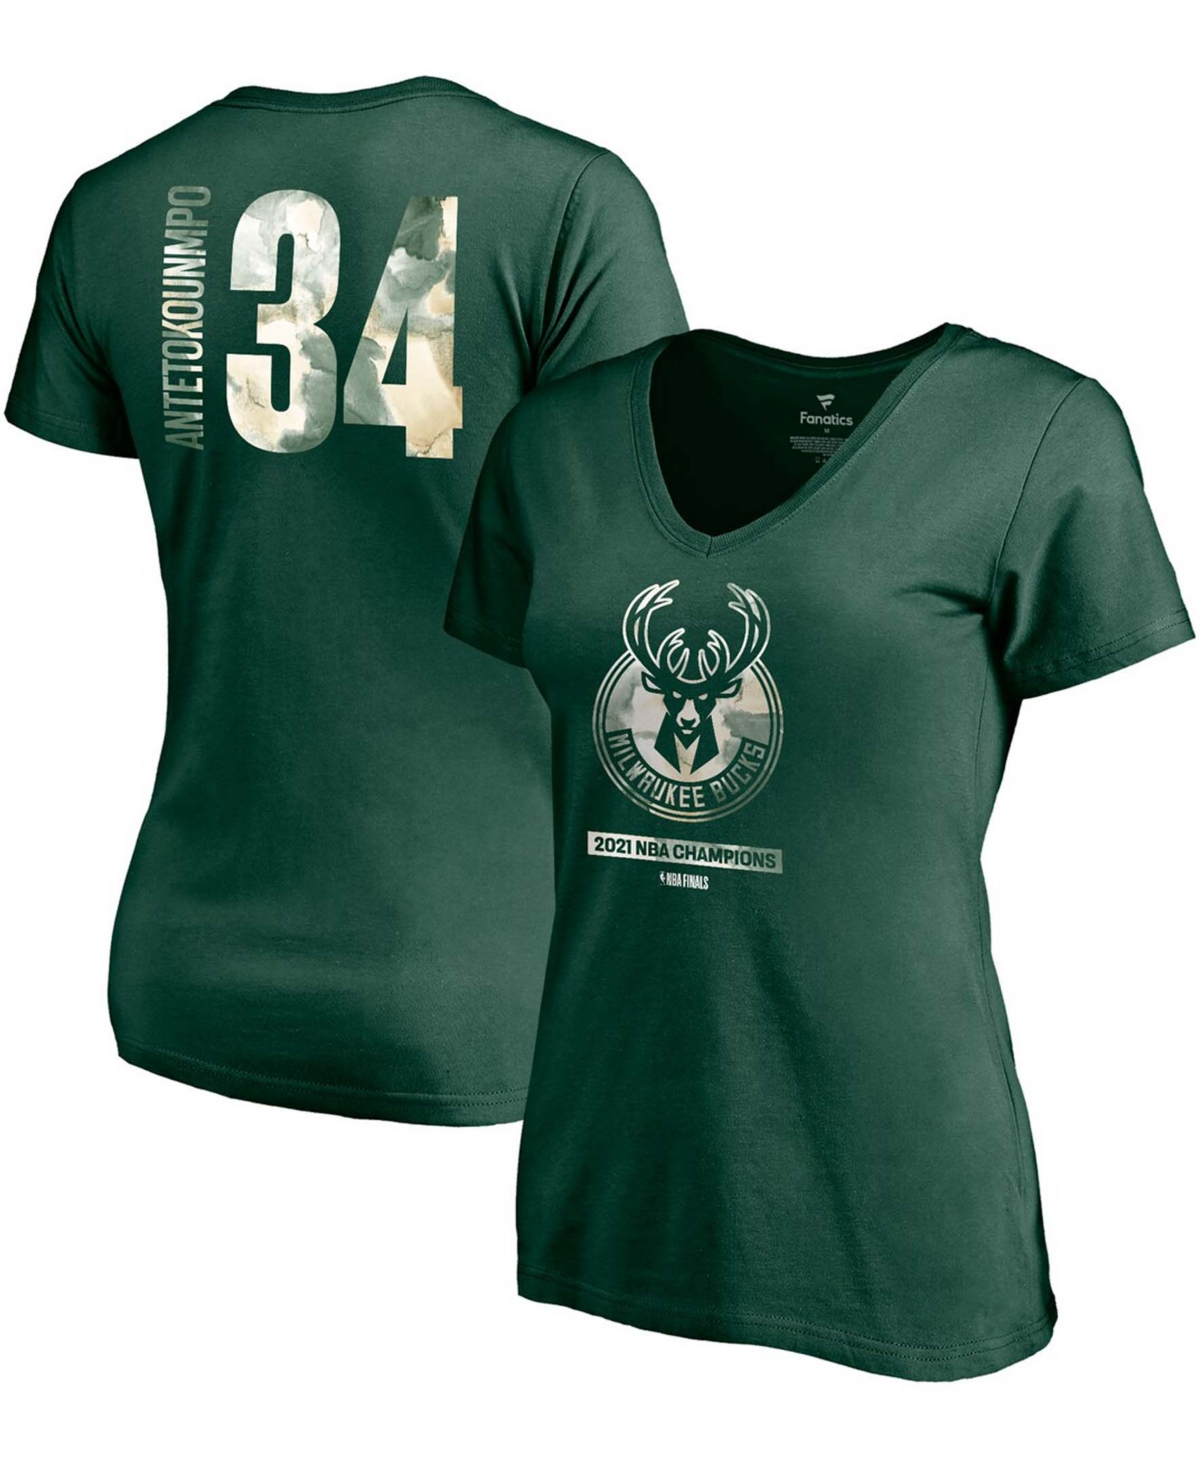 Women's Giannis Antetokounmpo Hunter Green Milwaukee Bucks 2021 Nba Finals Champions Believe The Game Name Number V-Neck T-shirt